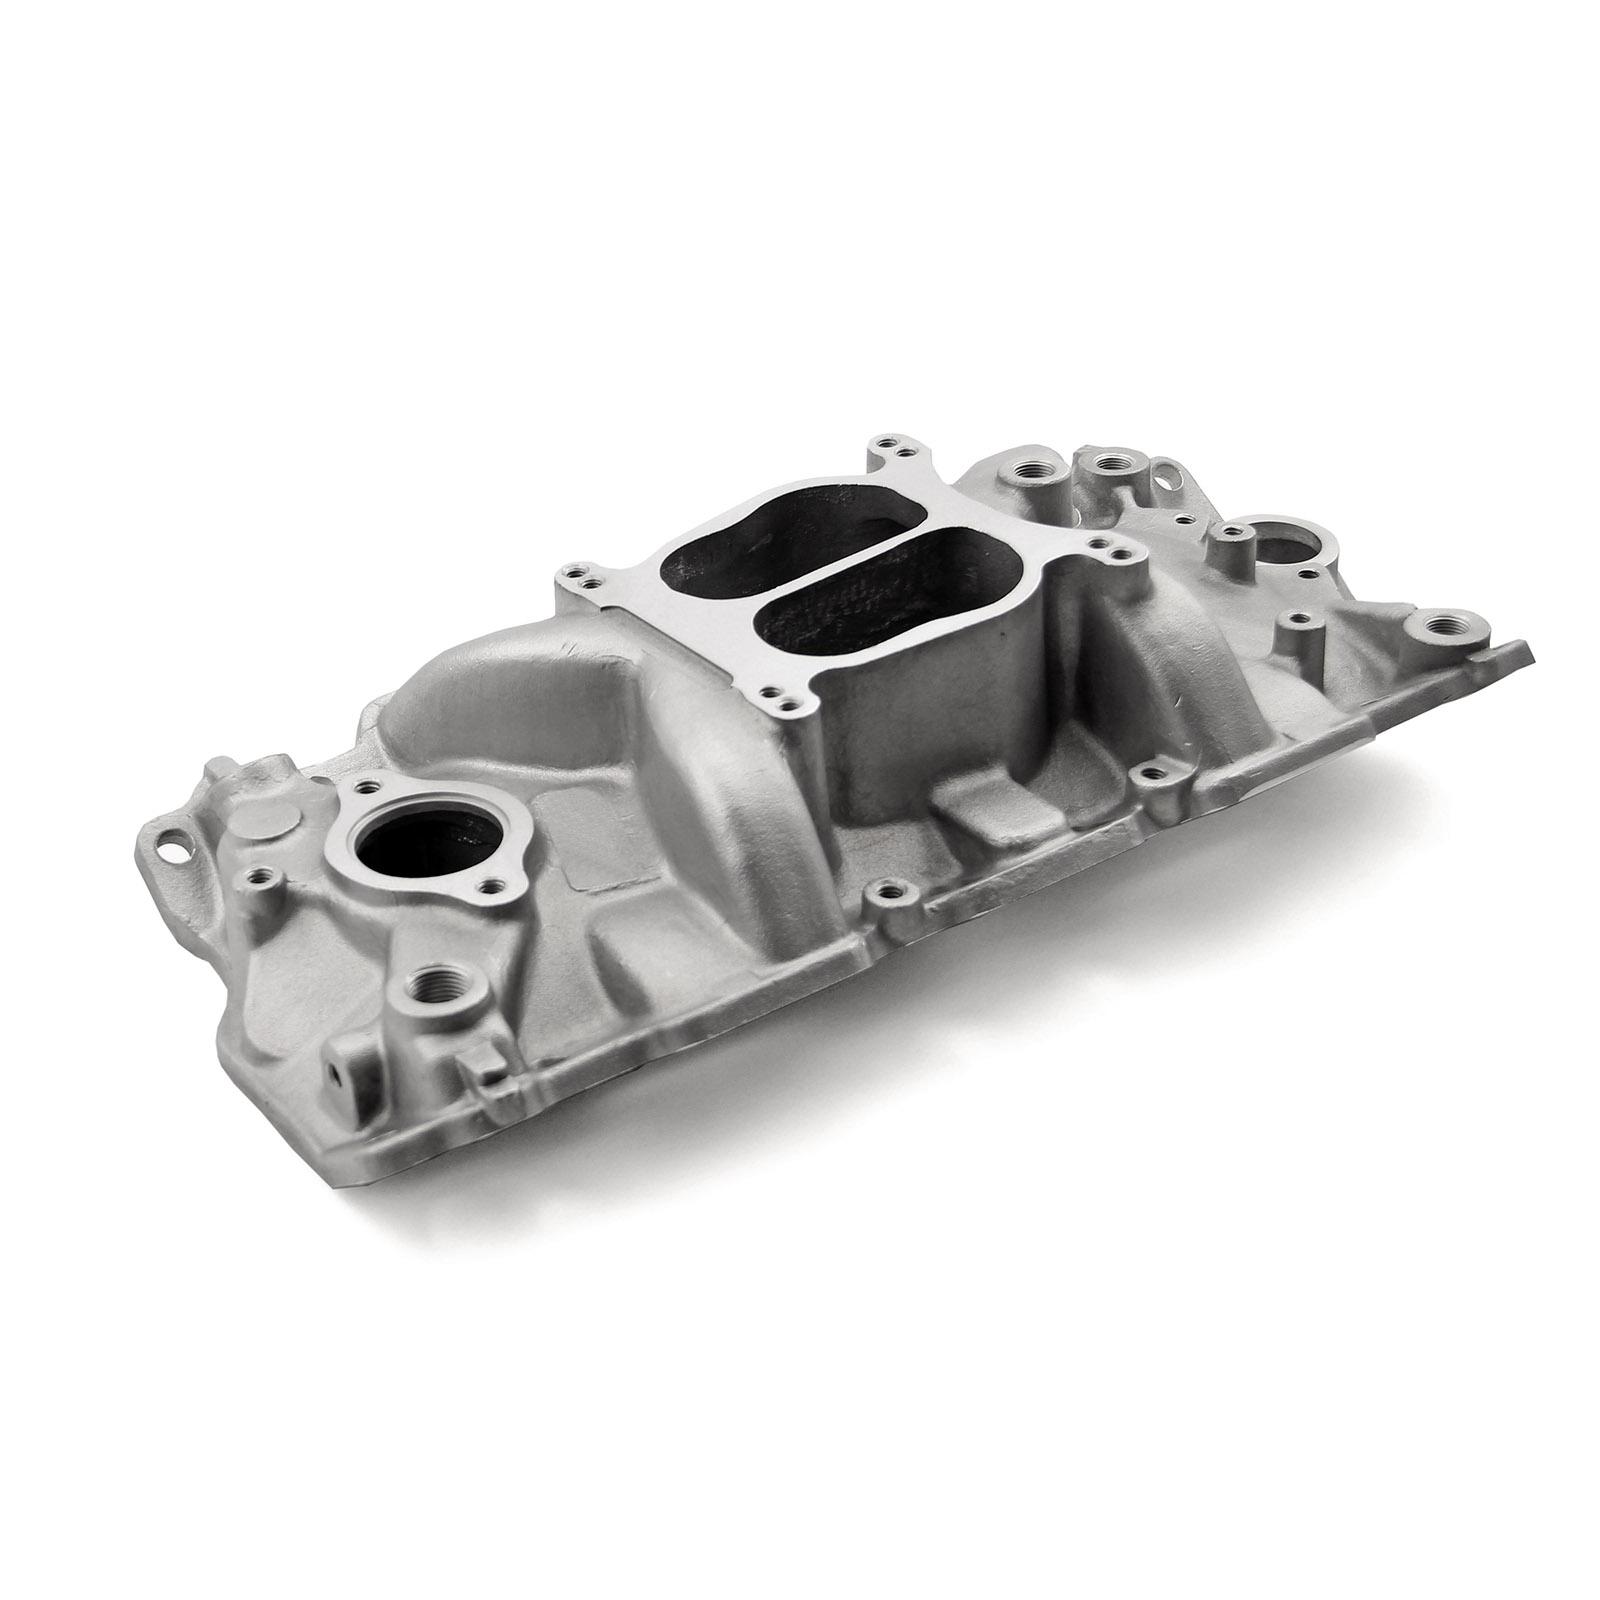 Chevy SBC 350 Holeshot 1957-85 (Non Egr) Intake Manifold